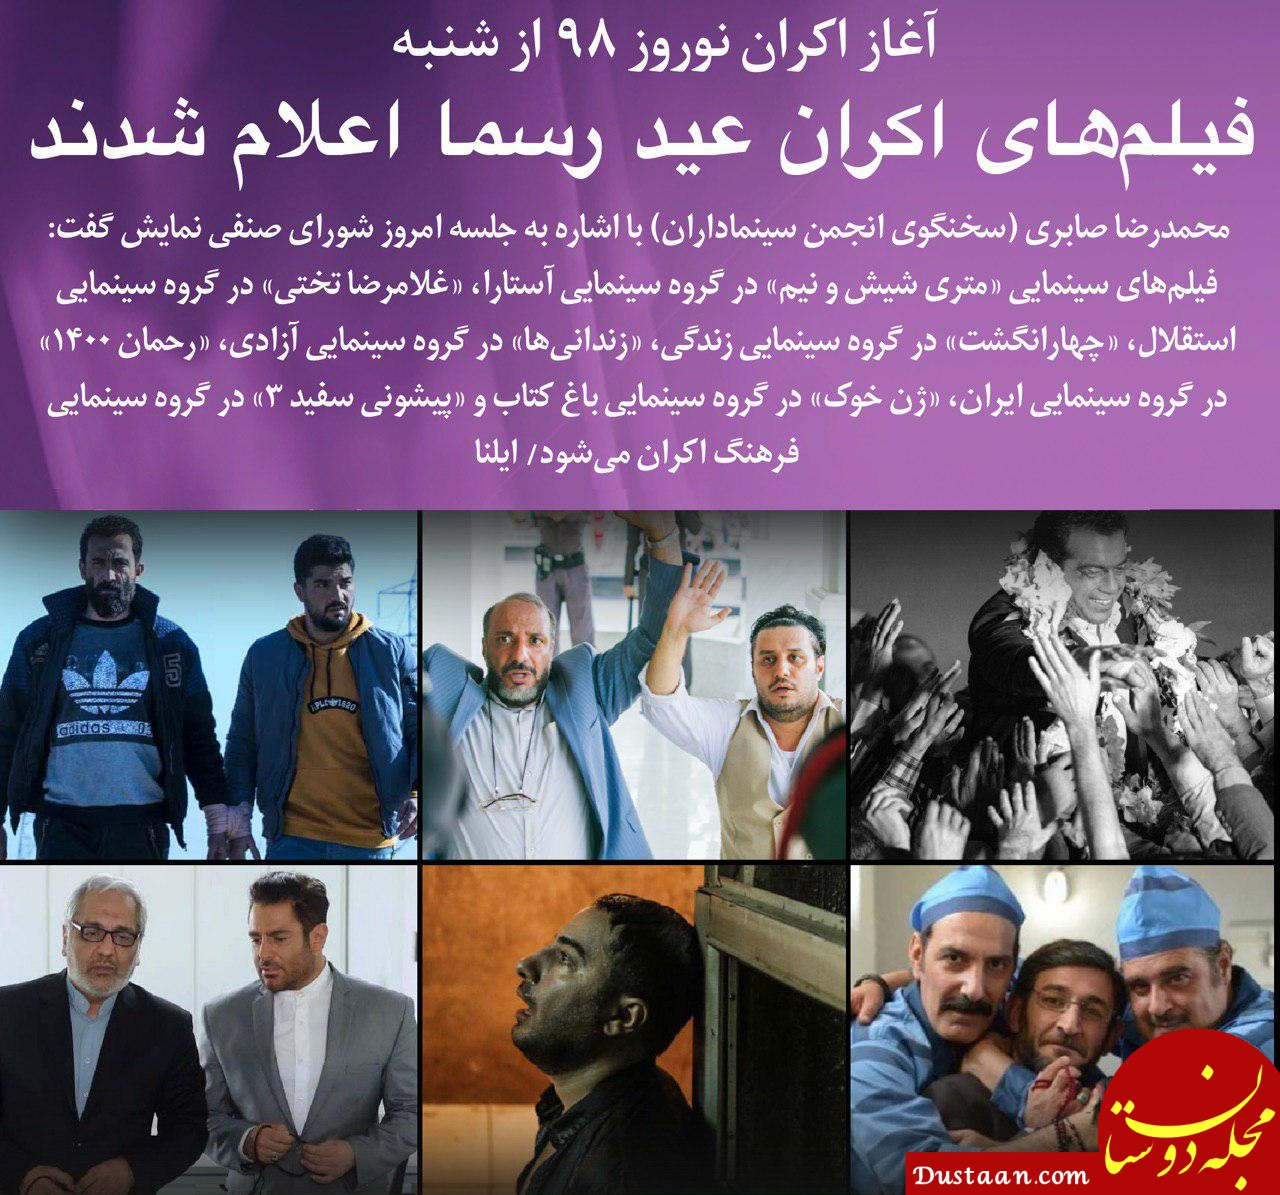 www.dustaan.com فیلم های سینمایی نوروز 98 مشخص شدند